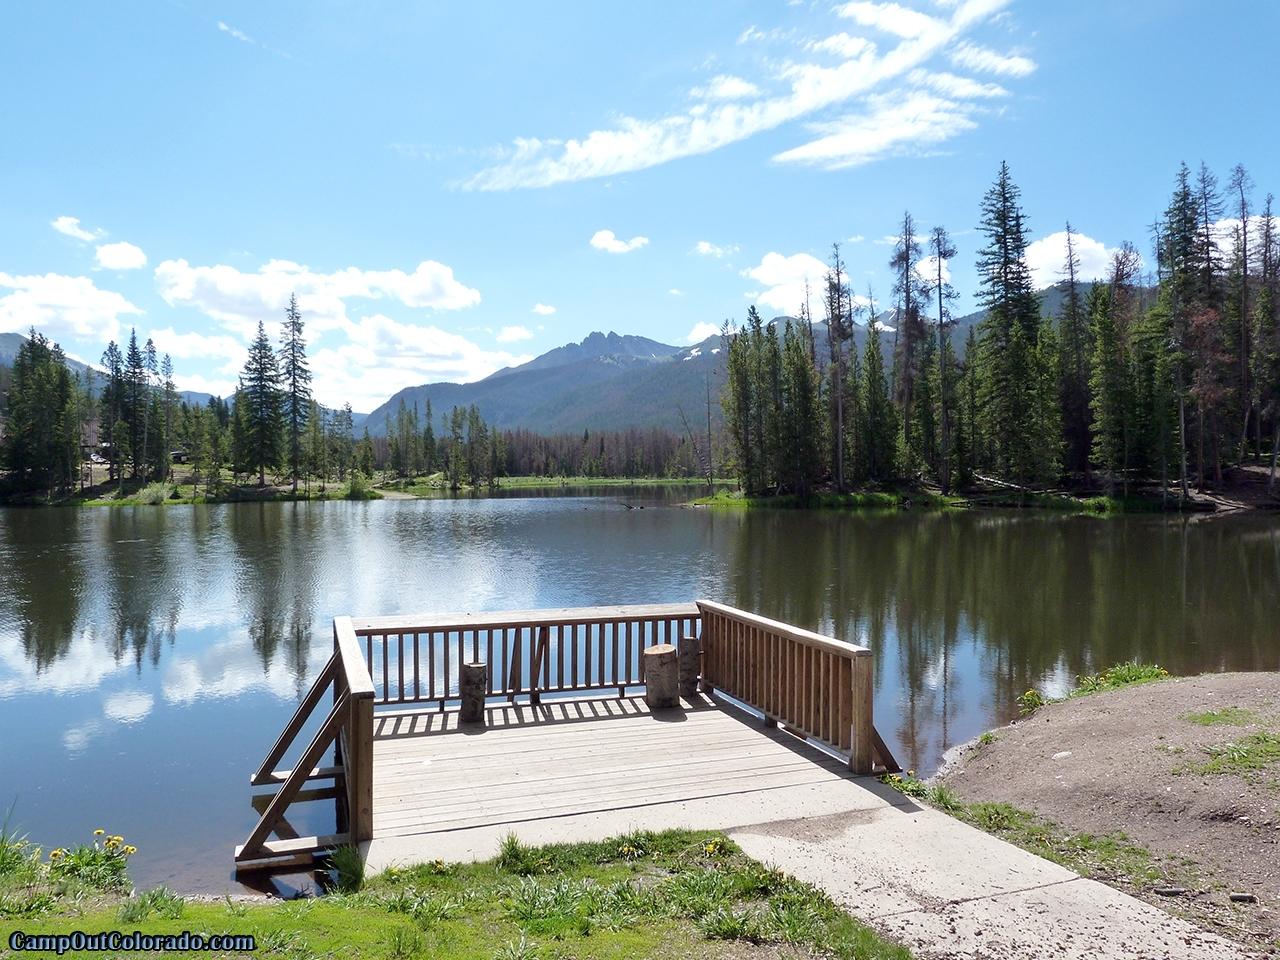 camp-out-colorado-ranger-lakes-campground-fishing-peer.jpg